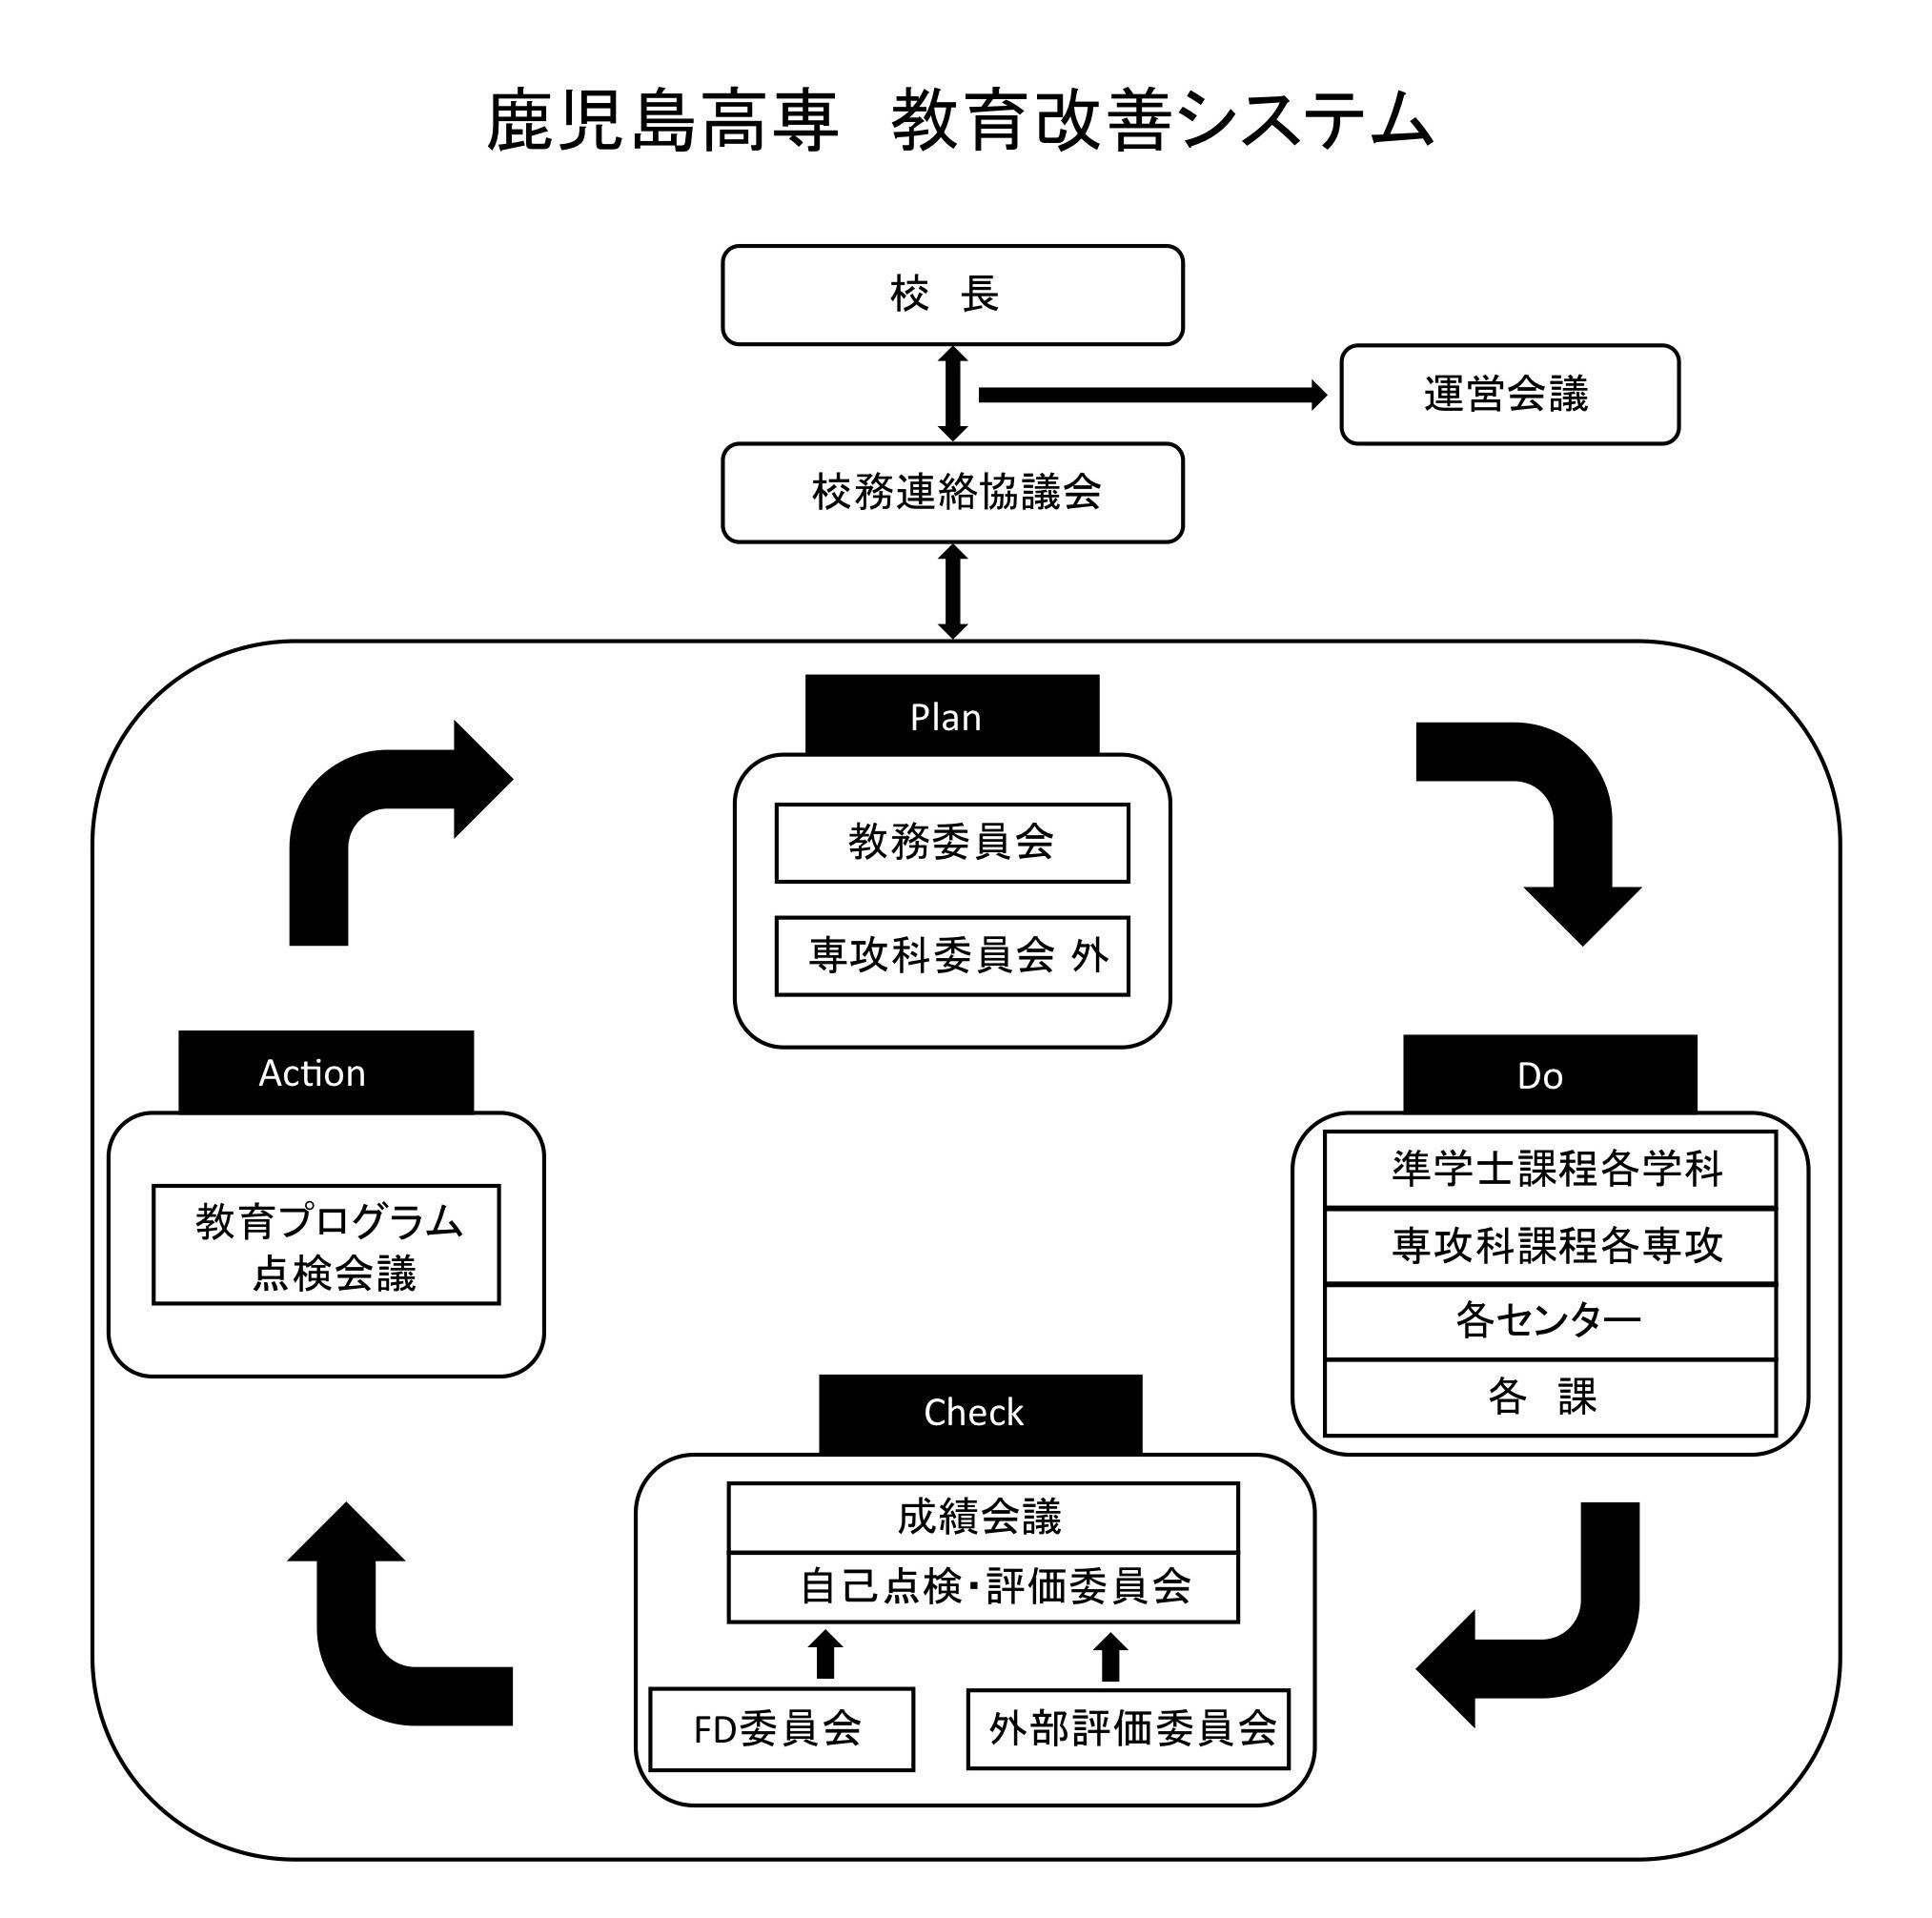 kaizen-system-trimming